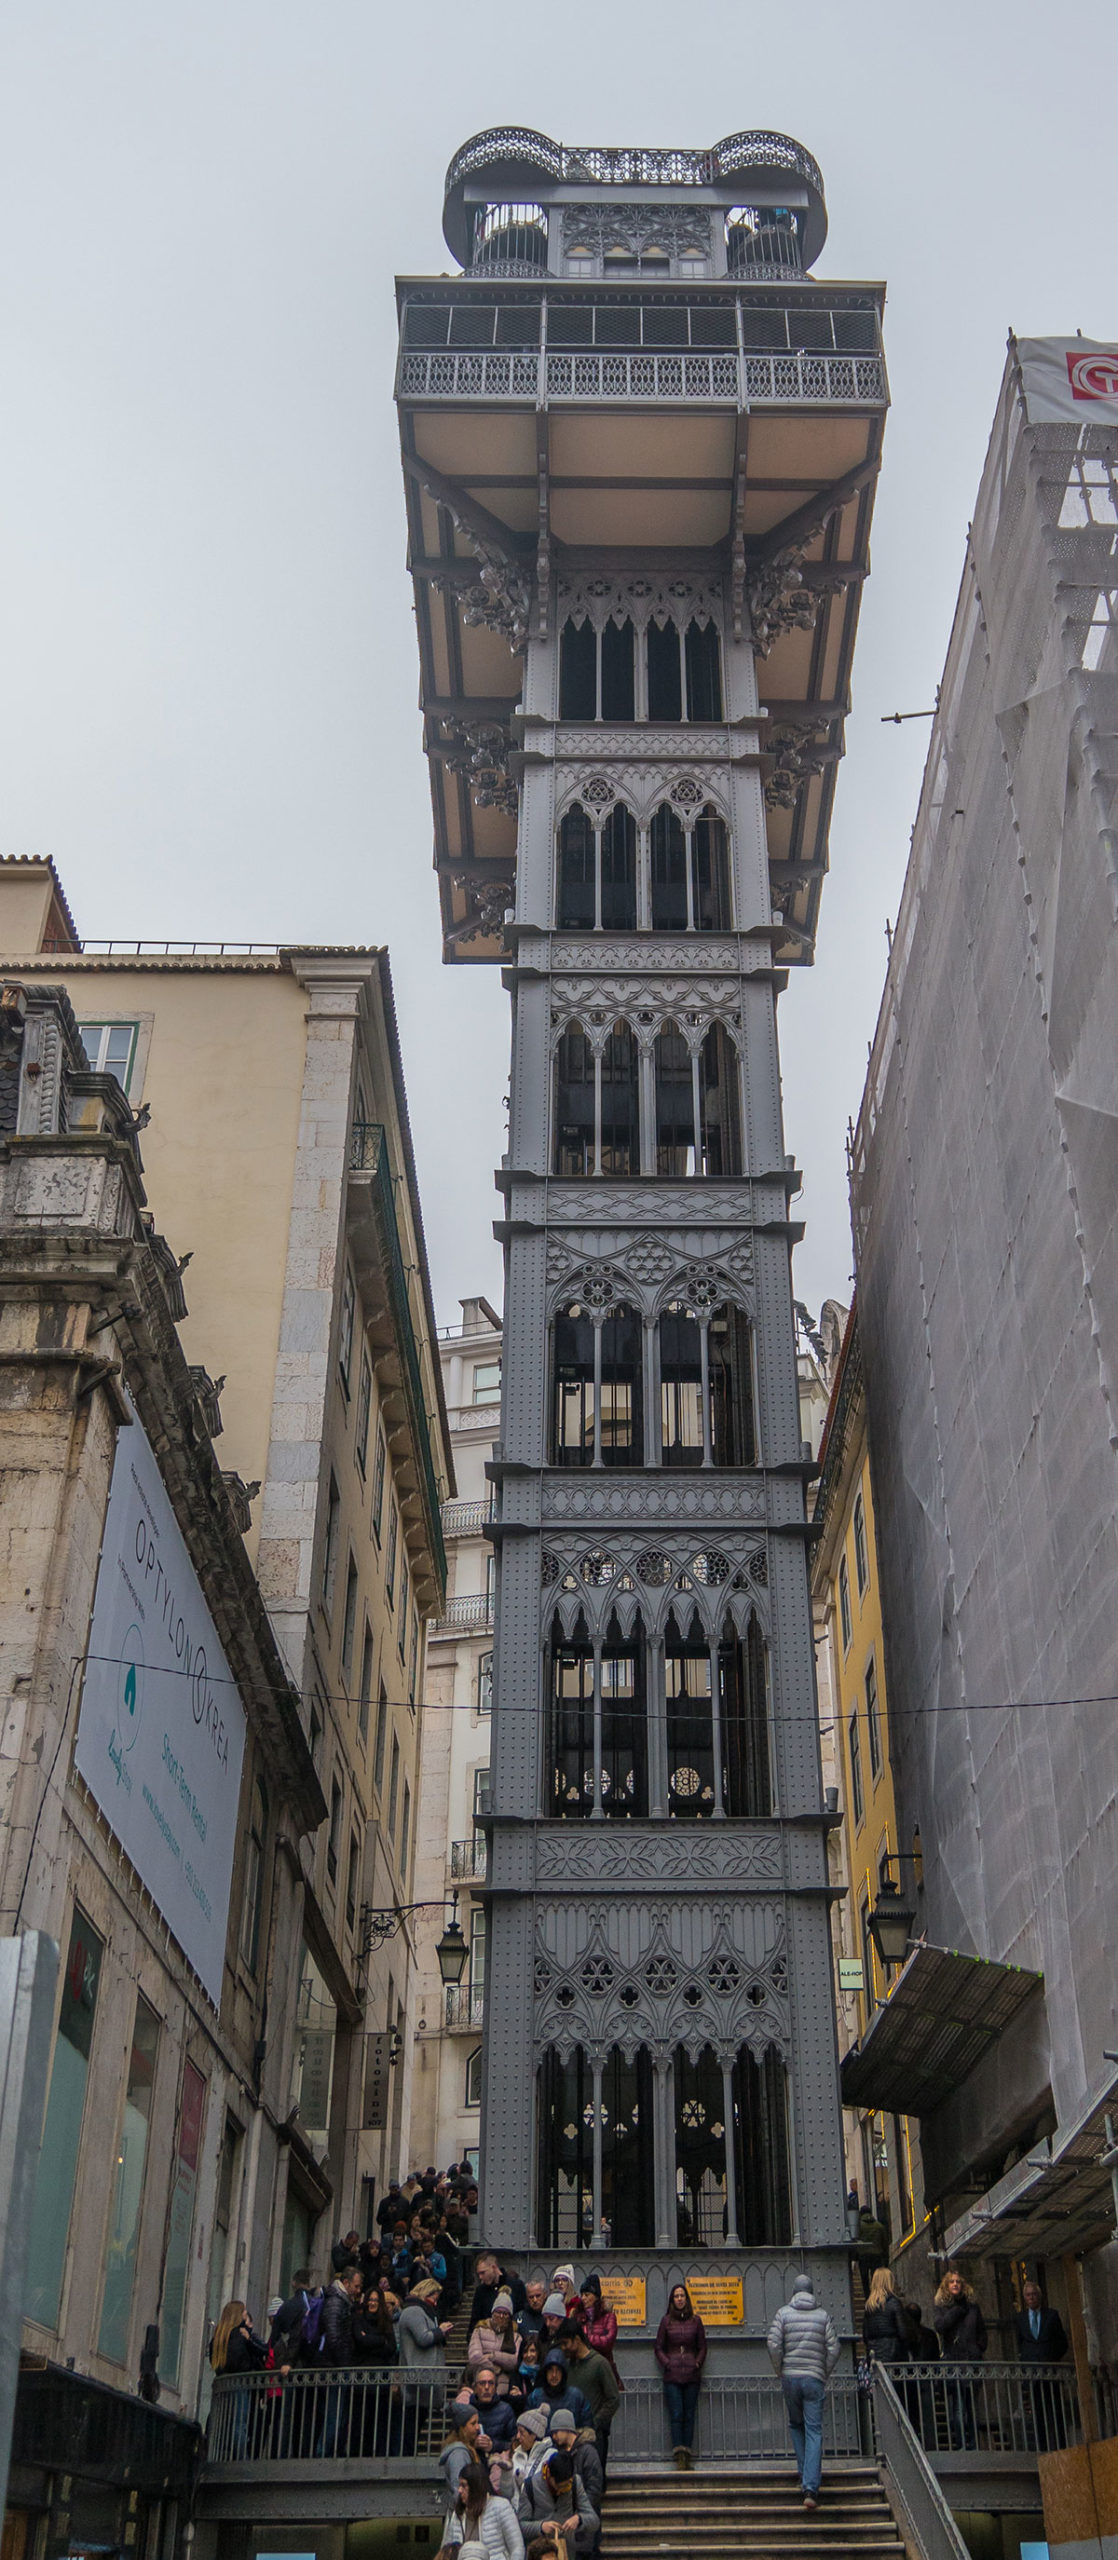 Portugal, Lissabon, Elevador de Santa Justa